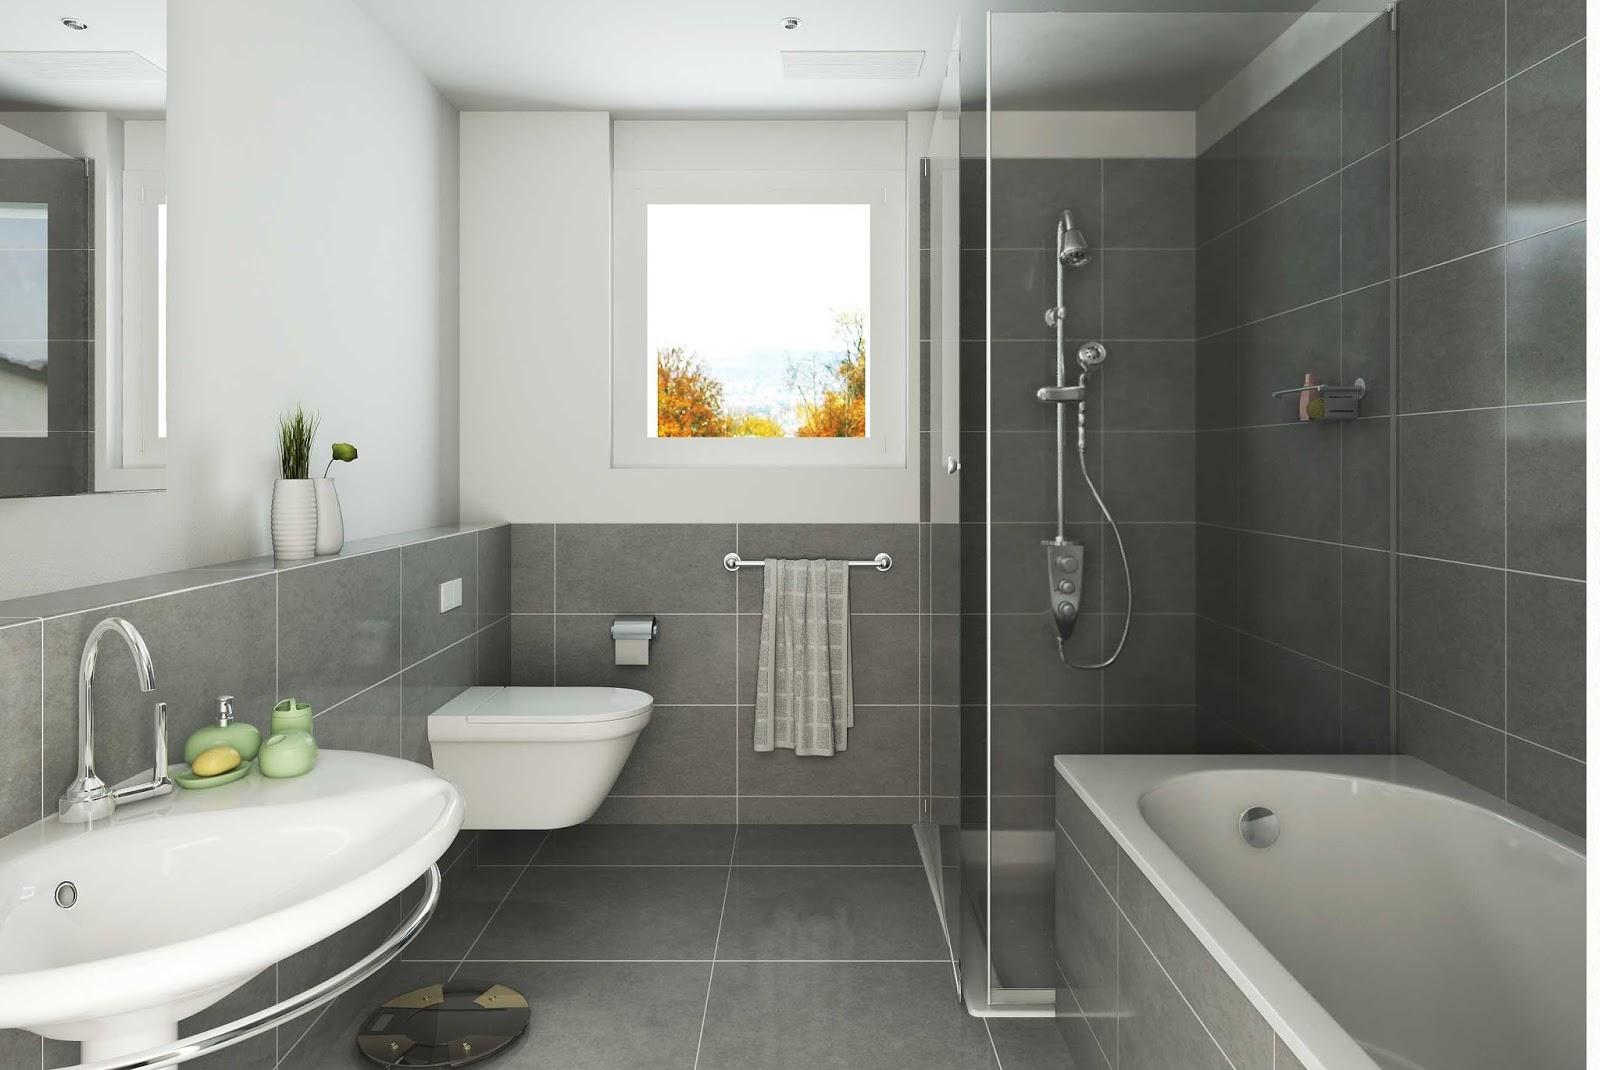 Интерьер ванной комнаты большой